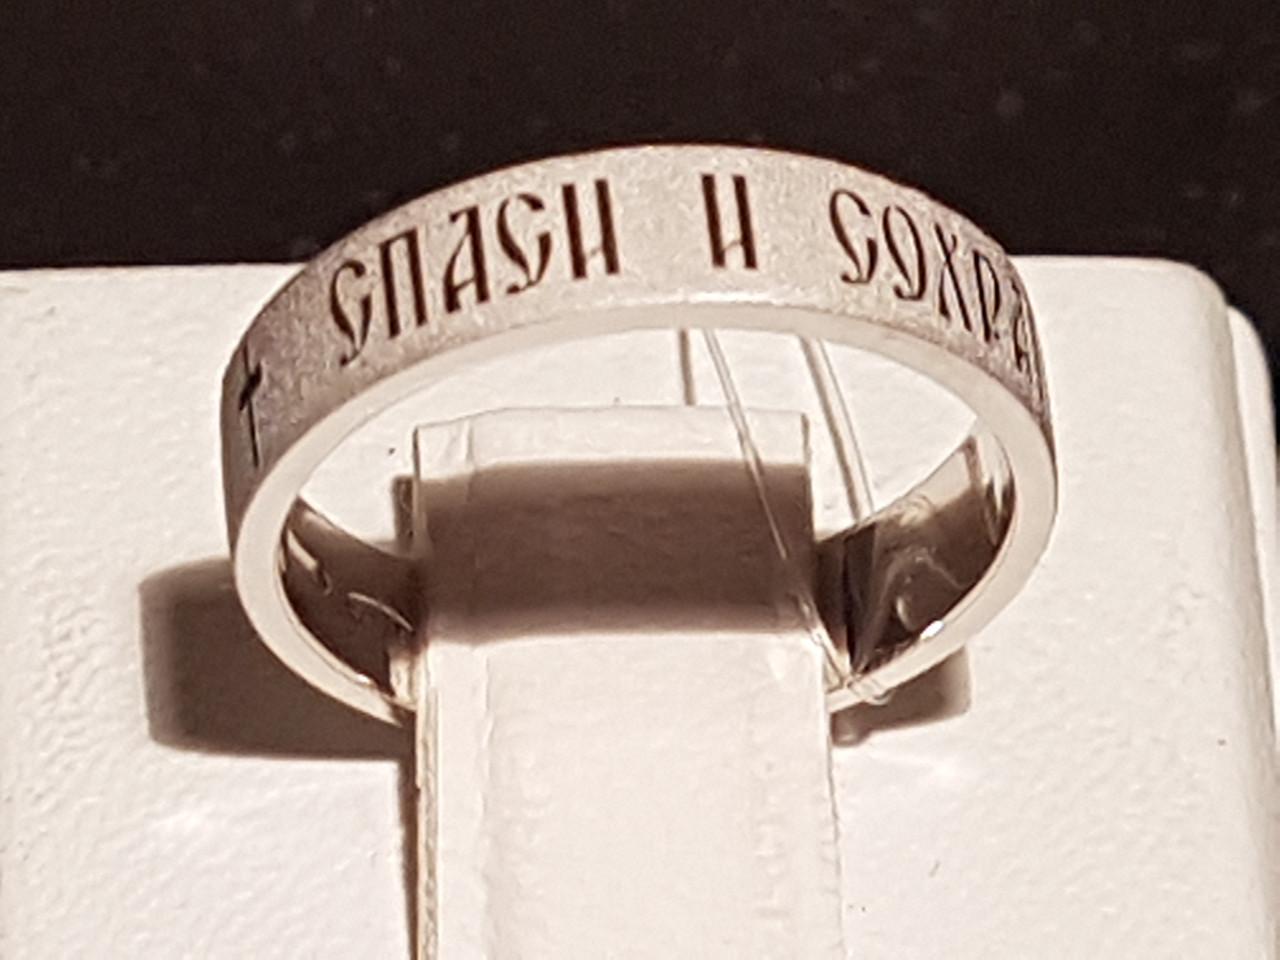 Серебряное кольцо Спаси и сохрани. Артикул 901-00992 16,5